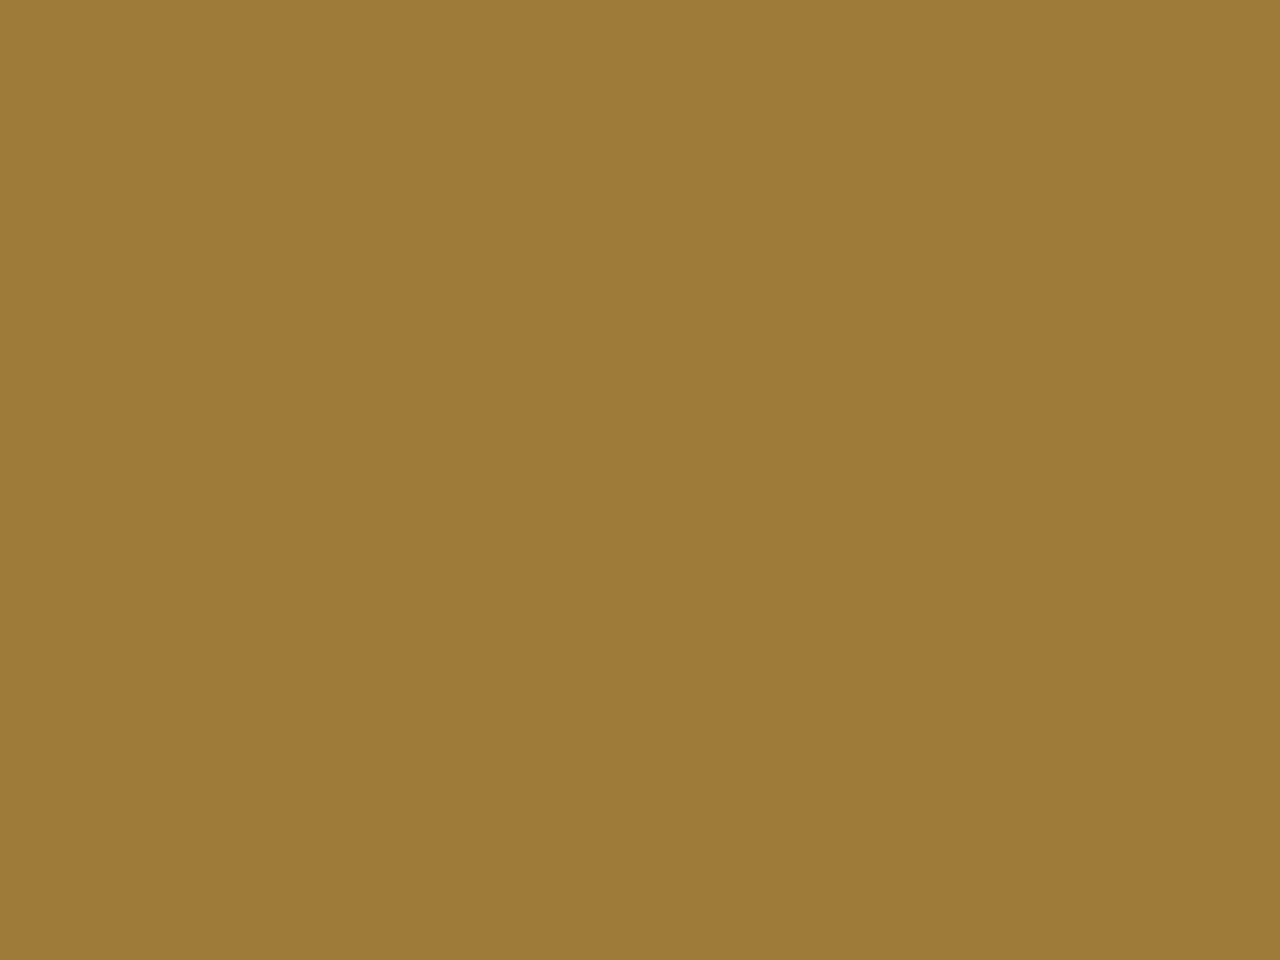 1280x960 Metallic Sunburst Solid Color Background